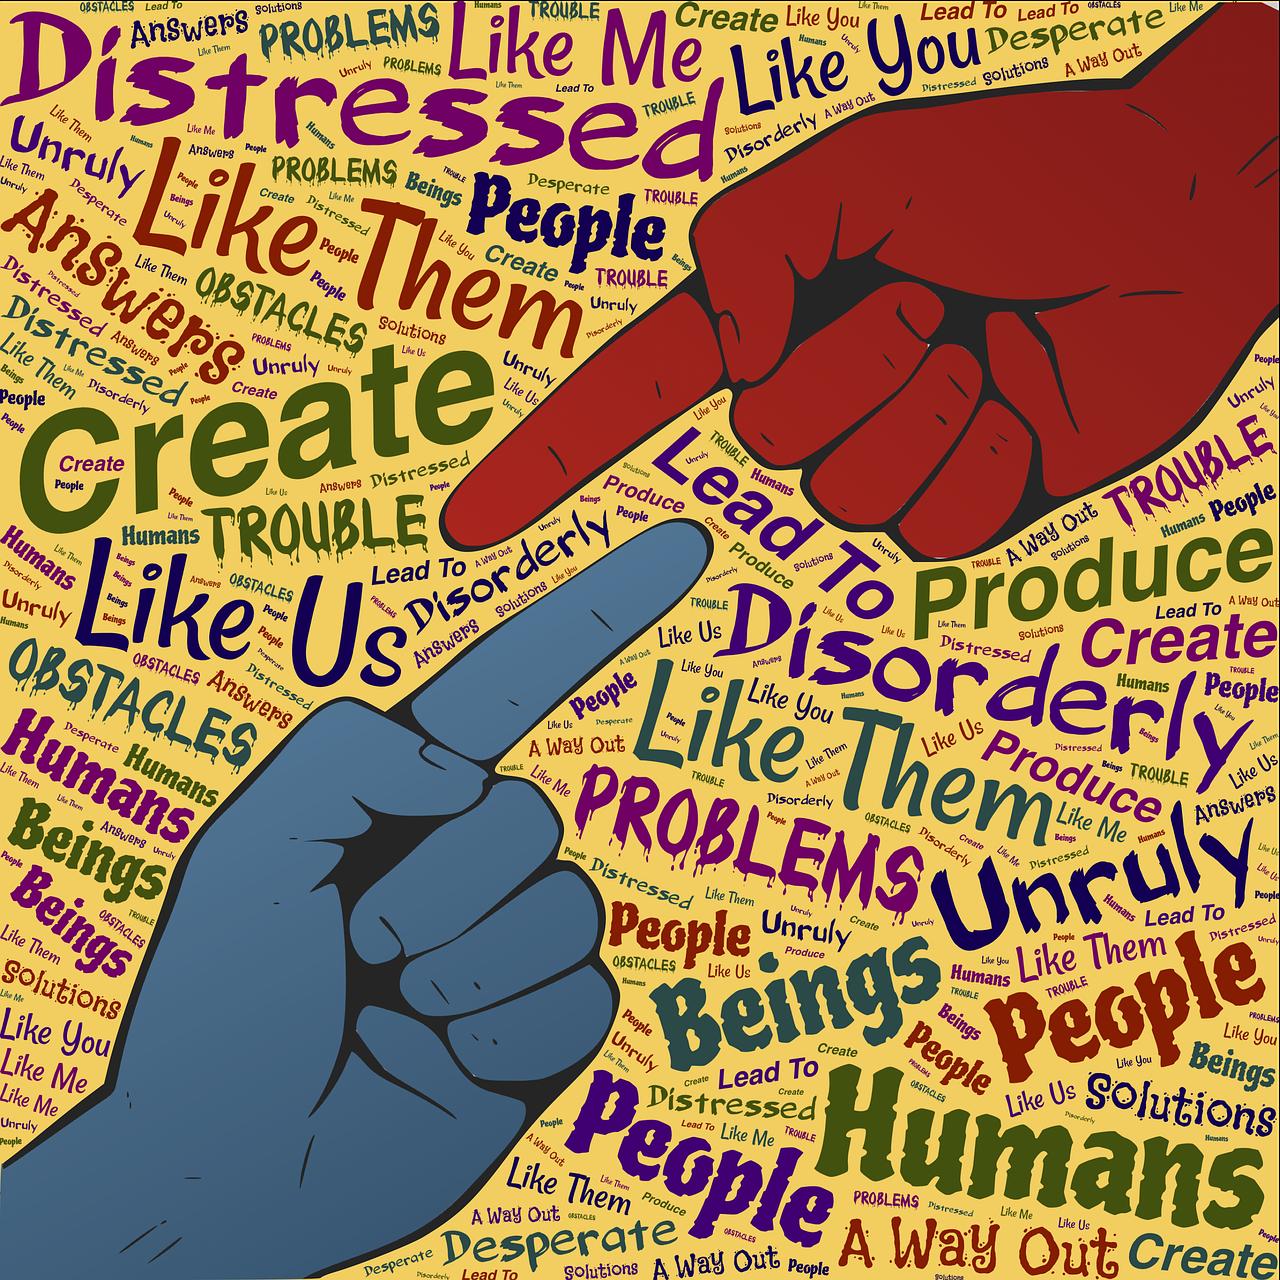 Fingerprinting Blaming Division - Free image on Pixabay